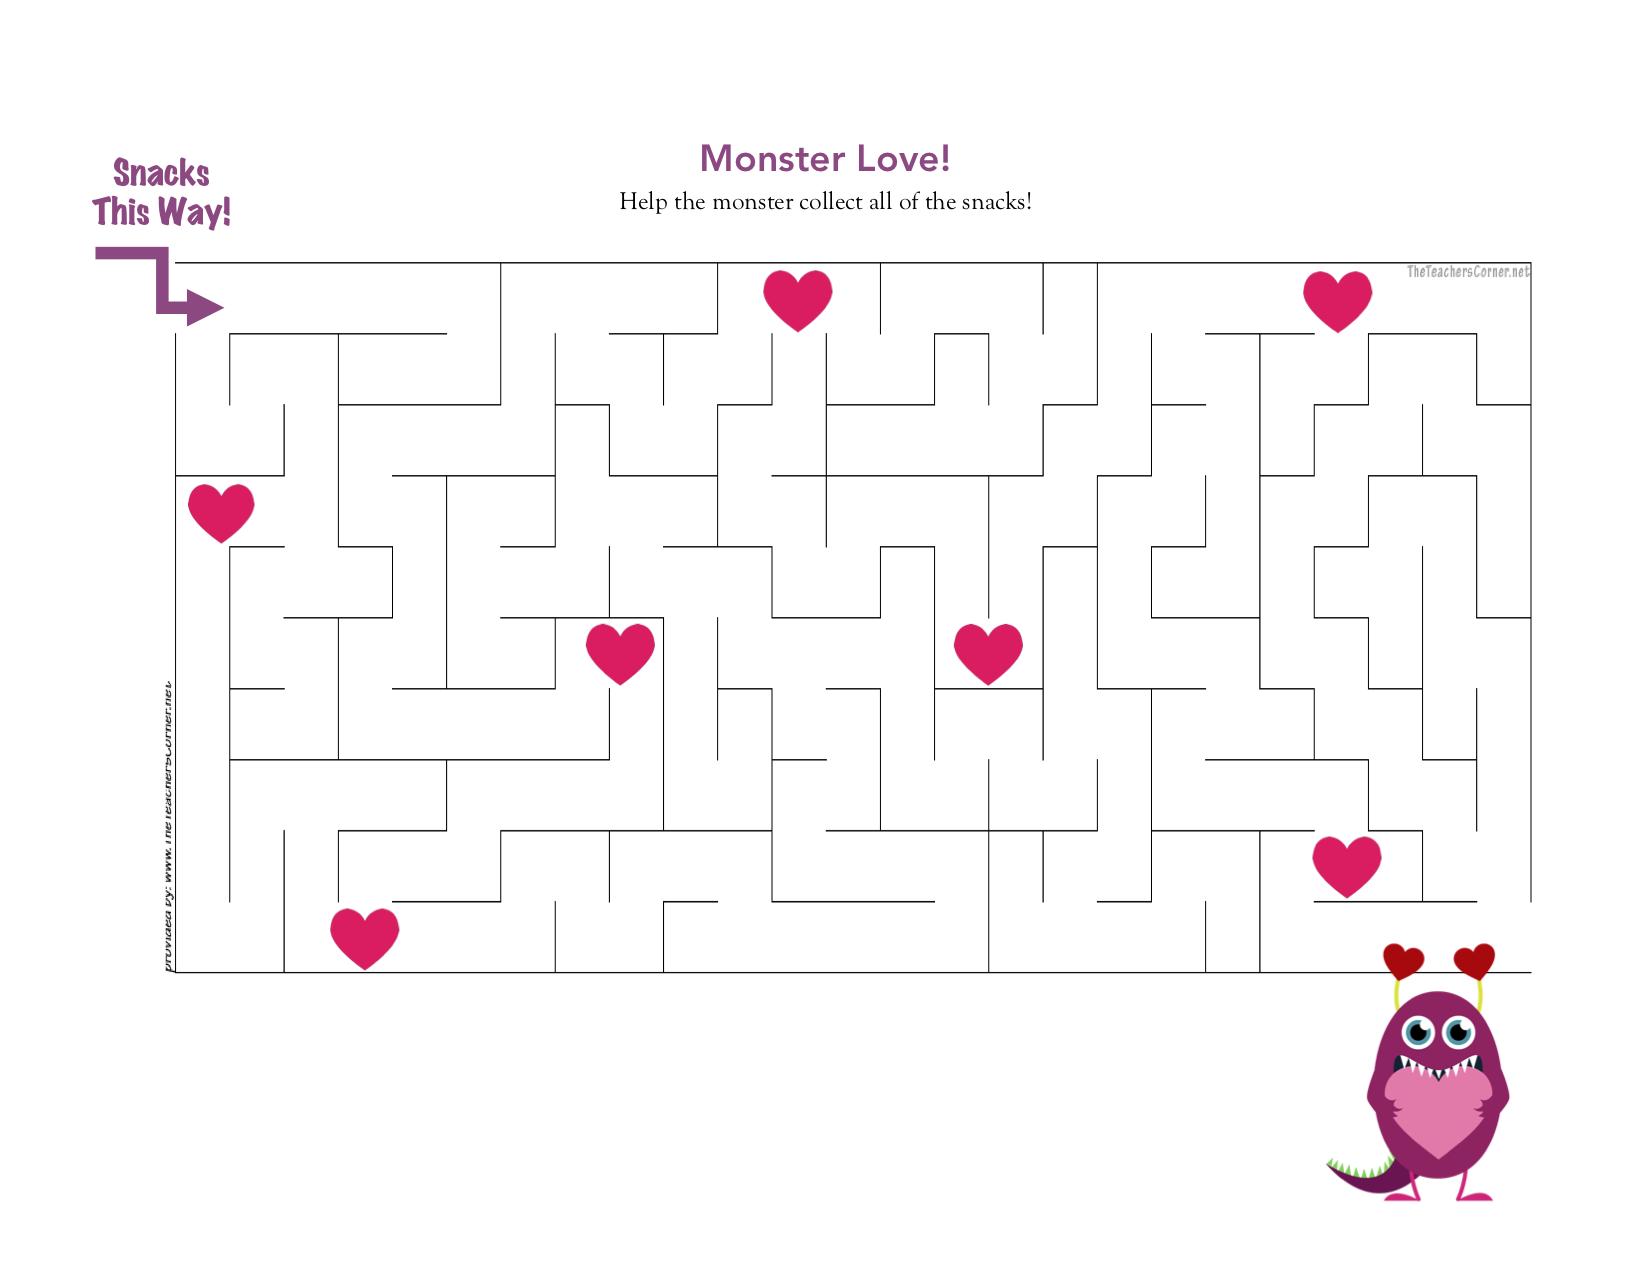 cpb - monster love maze